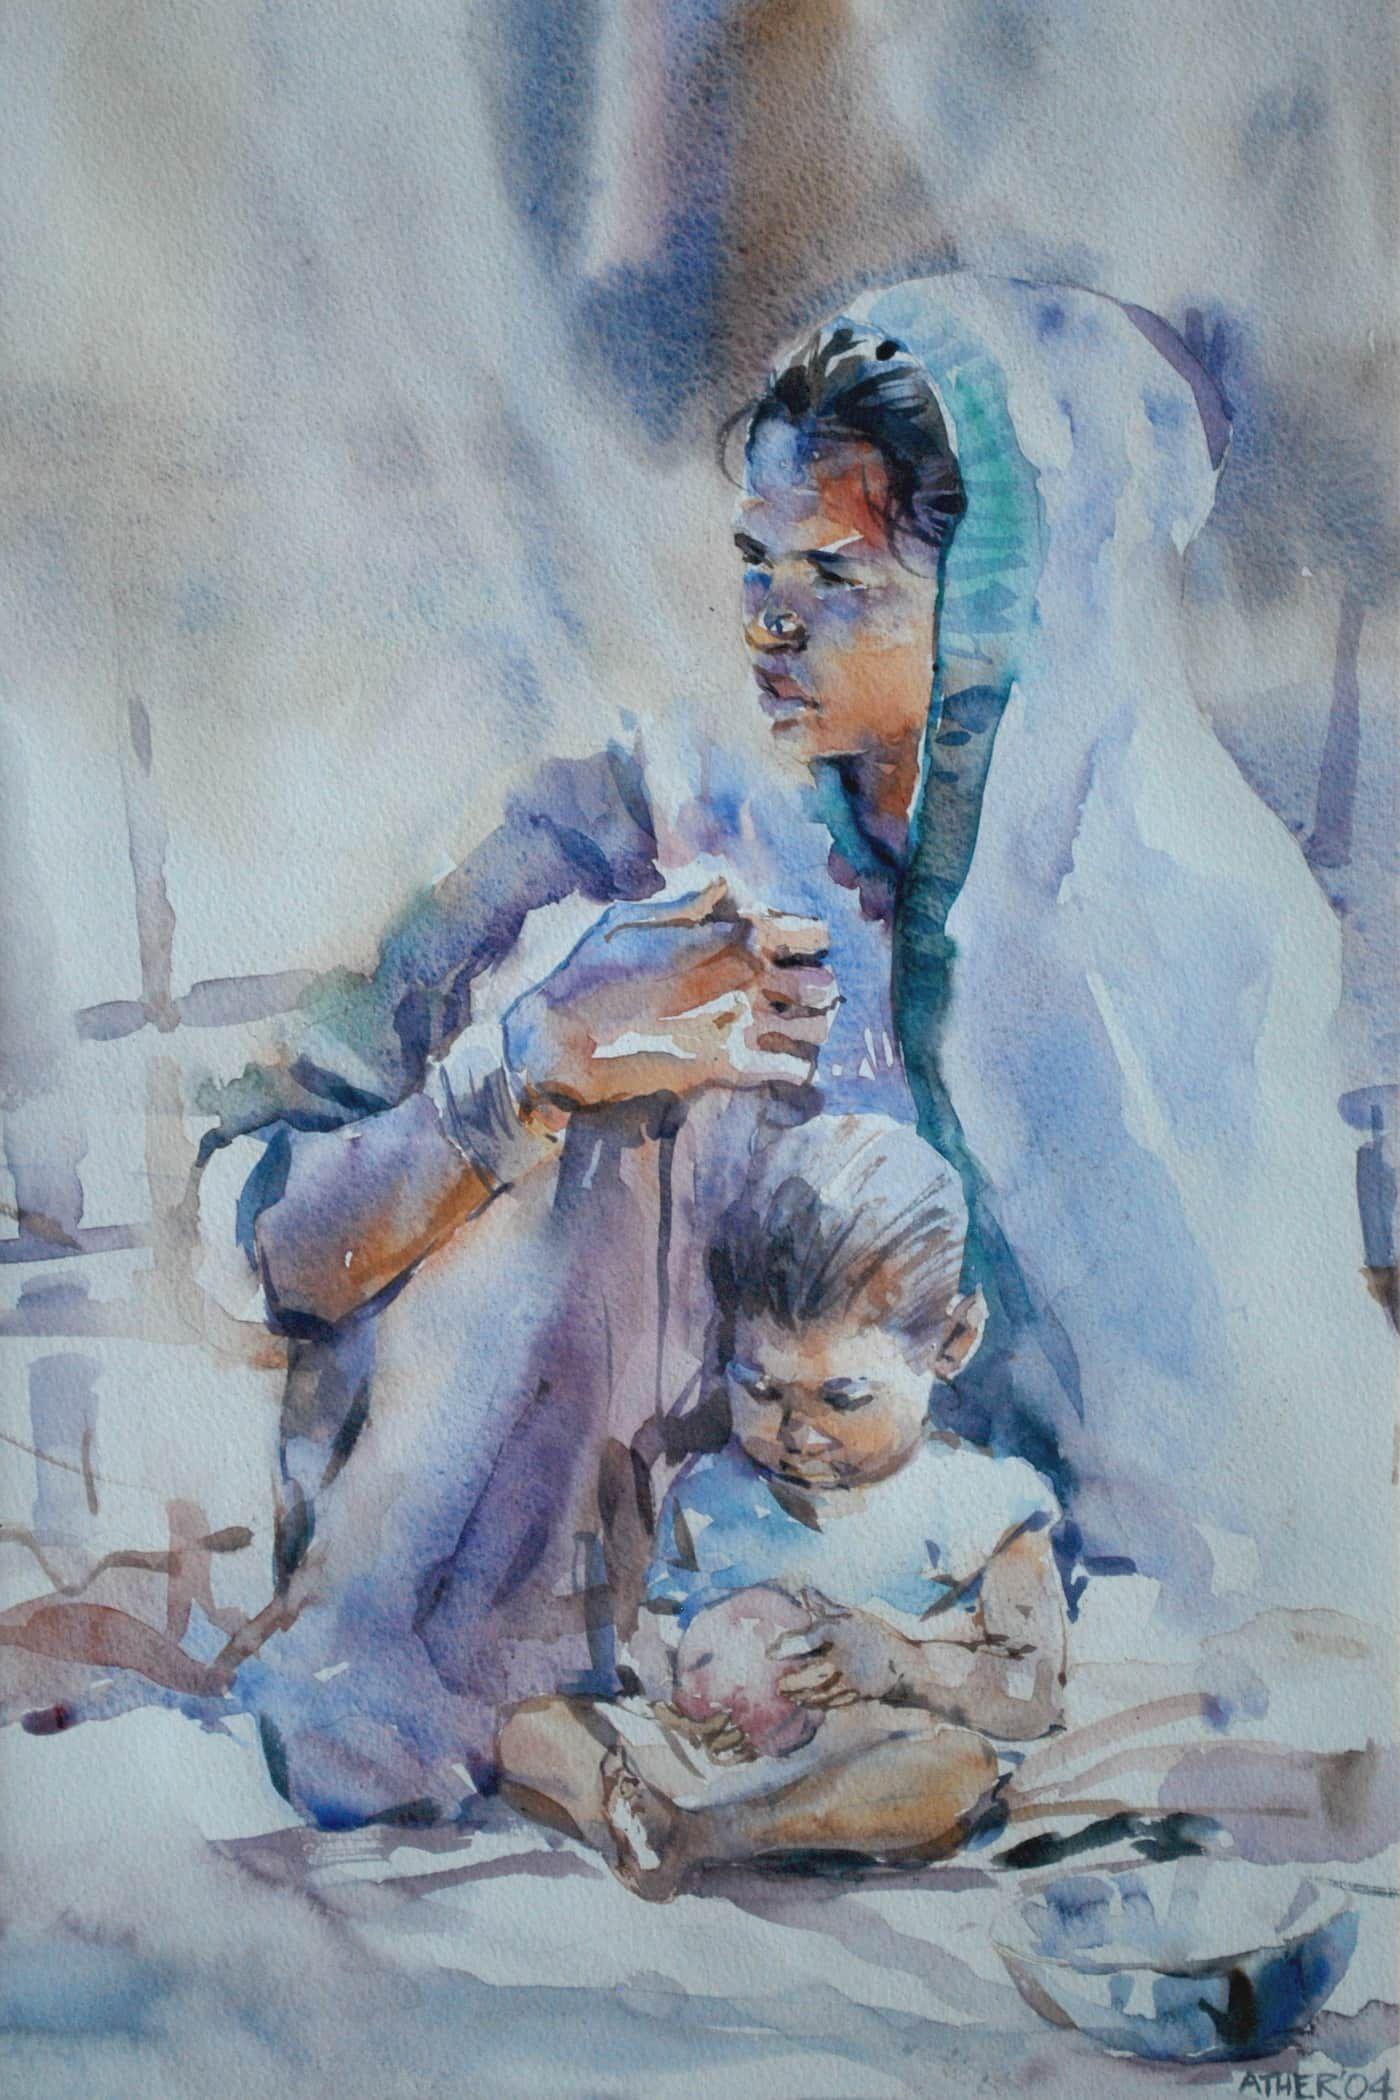 Ather Jamal Clifton Art Galleryclifton Art Gallery Artist